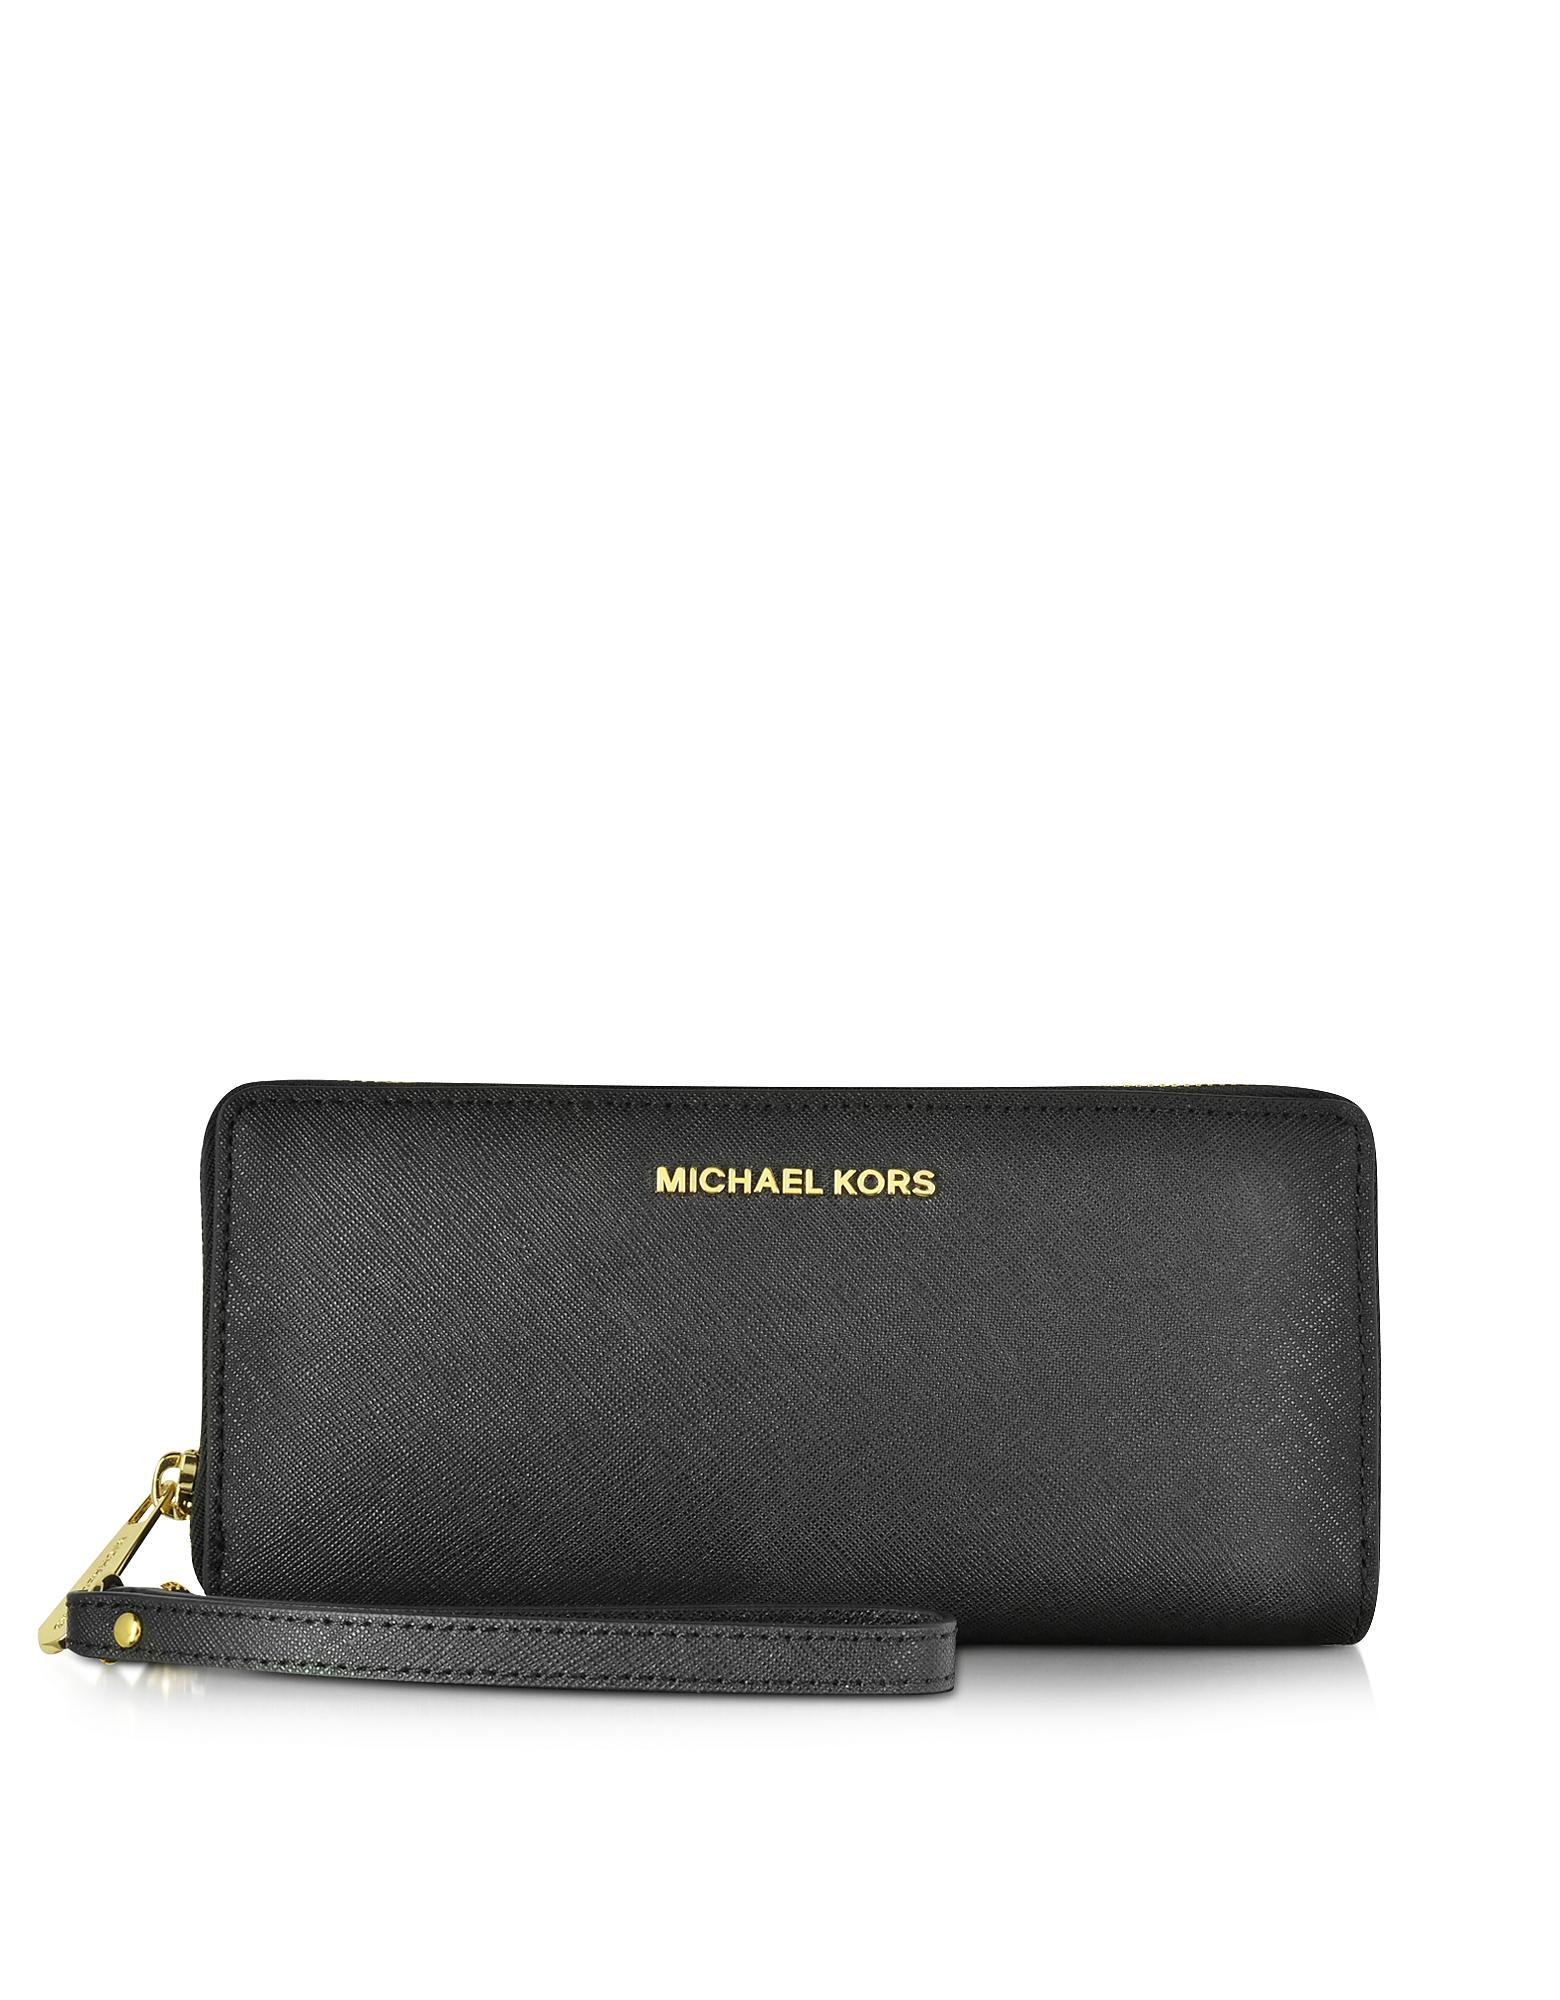 Michael Kors Handbags, Jet Set Travel Large Continental Wristlet Leather Wallet